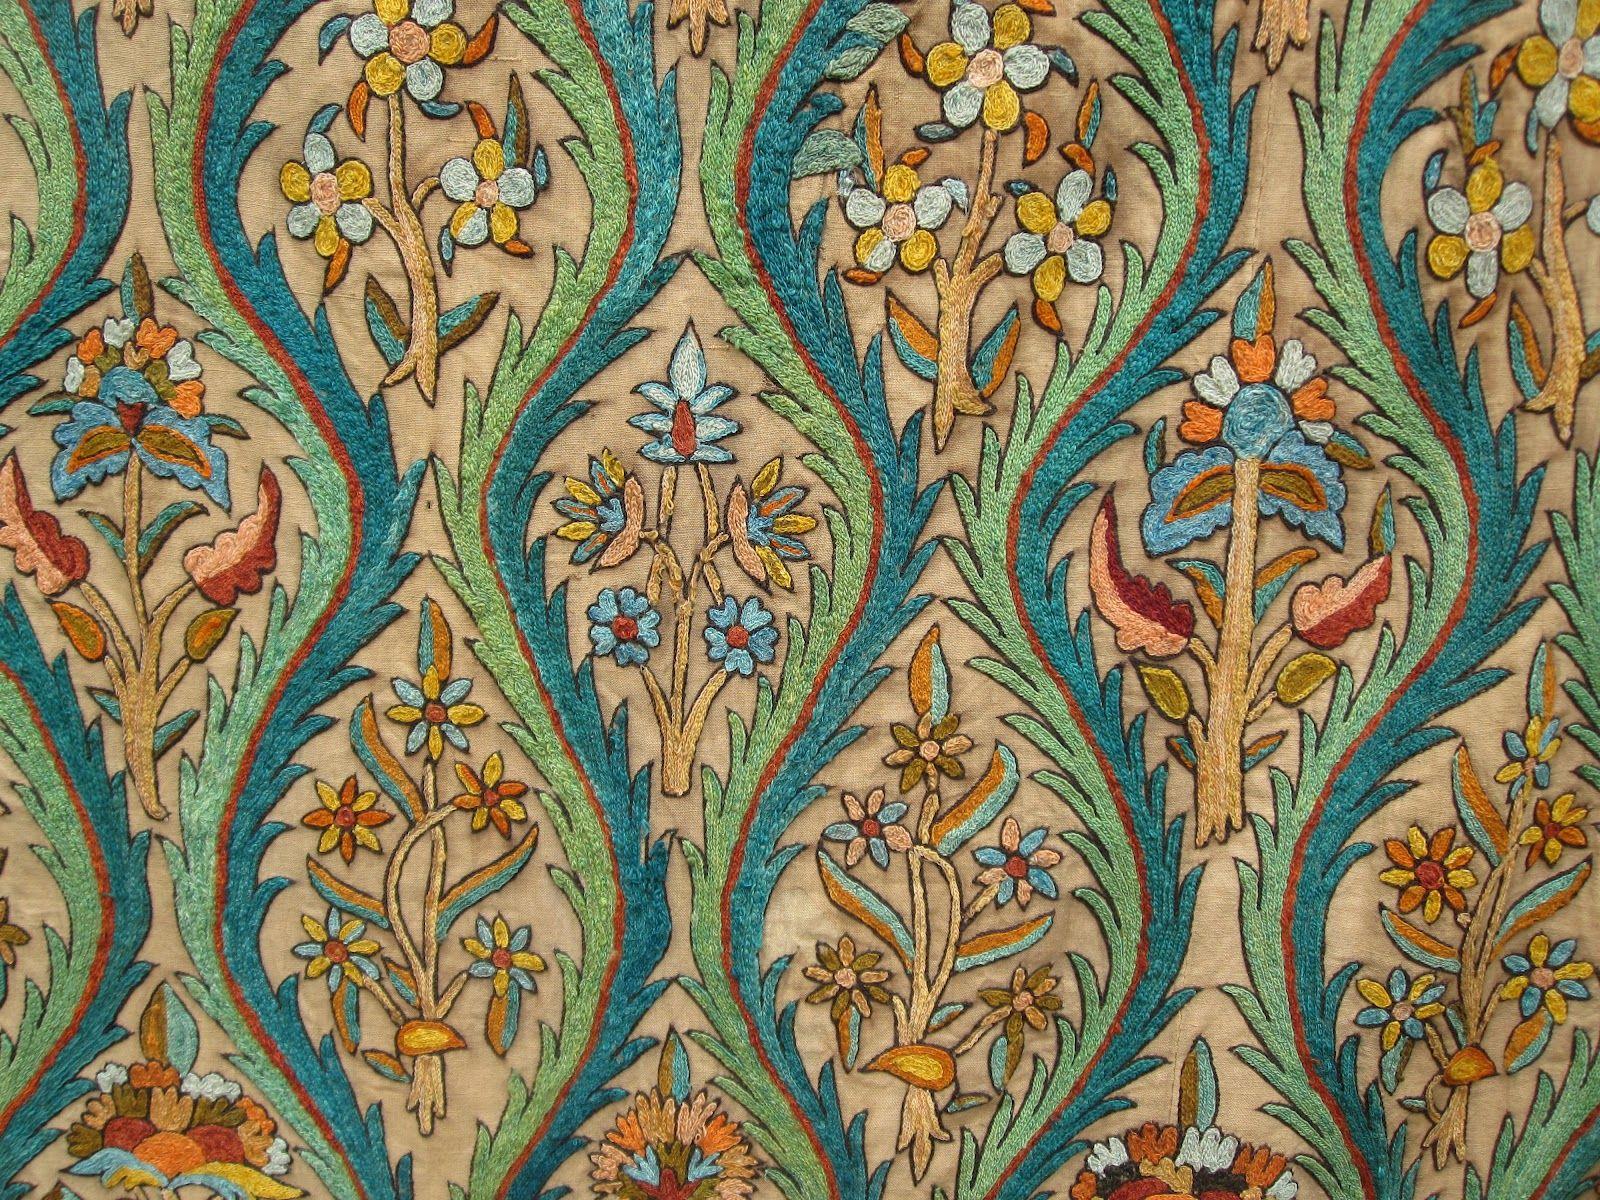 Arts And Crafts Movement William Morris Arts Crafts